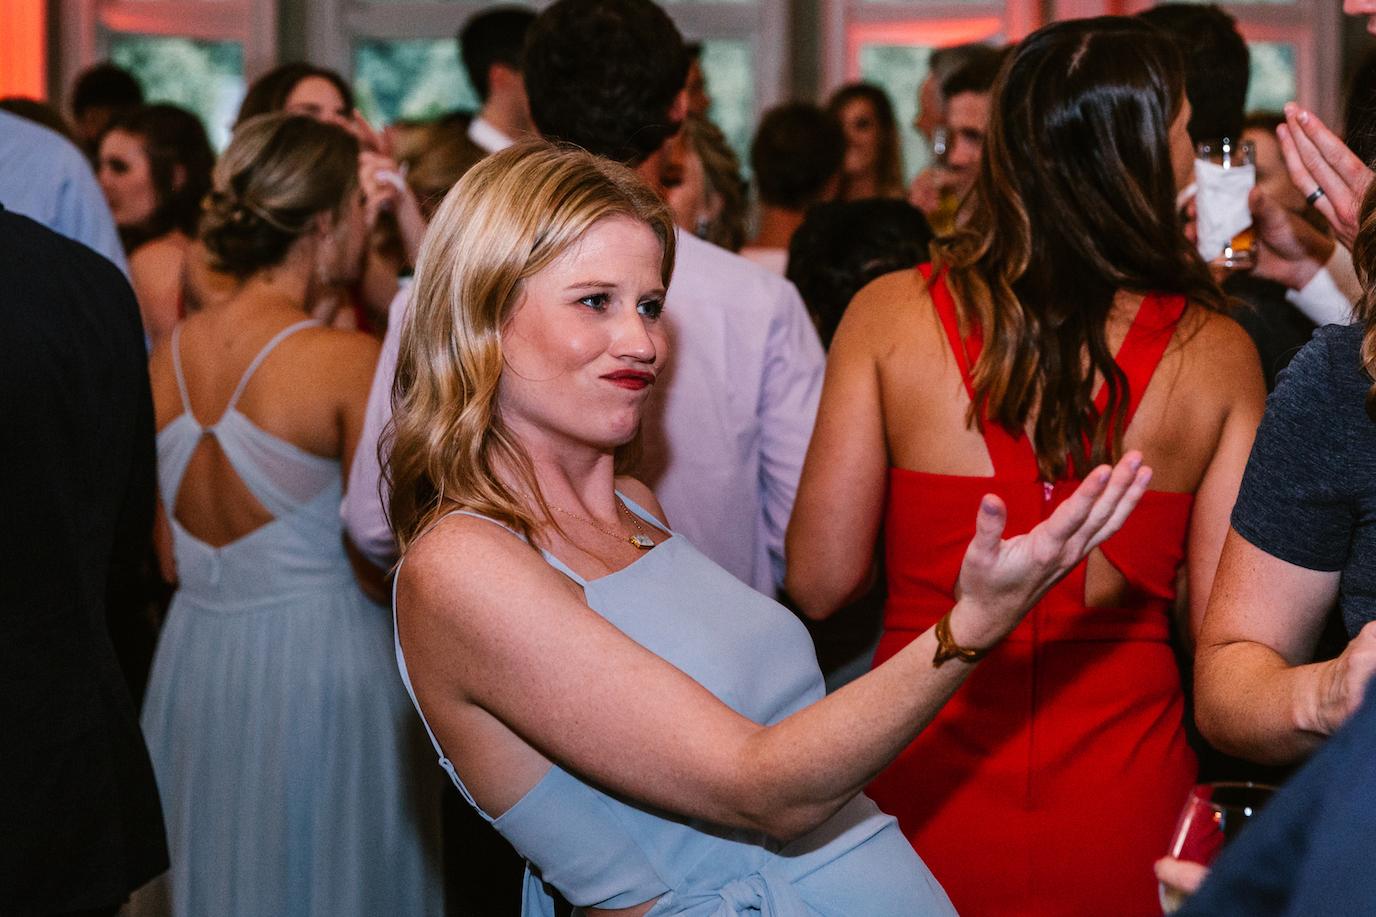 wedding-engagement-photographer-spartanburg-greenville-columbia-carolina-south-north-541.JPG